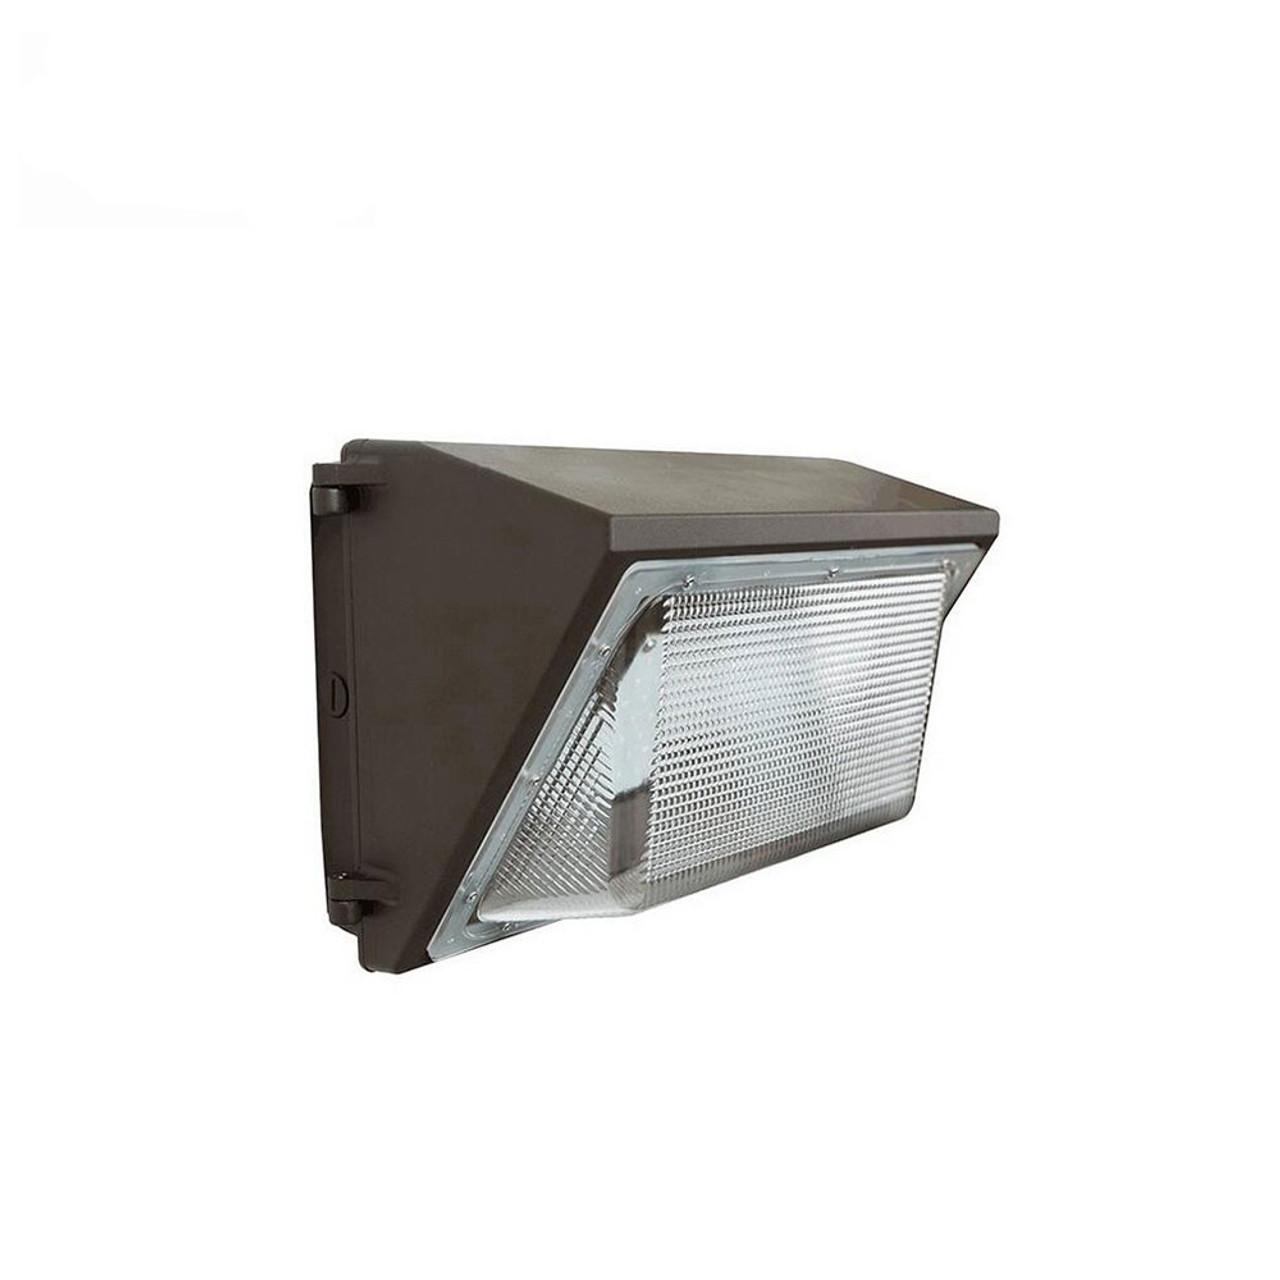 LED Wall Pack, 65 Watt, 7300 lumen, 5000 Kelvin, 100-277 volt, UL and DLC Listed